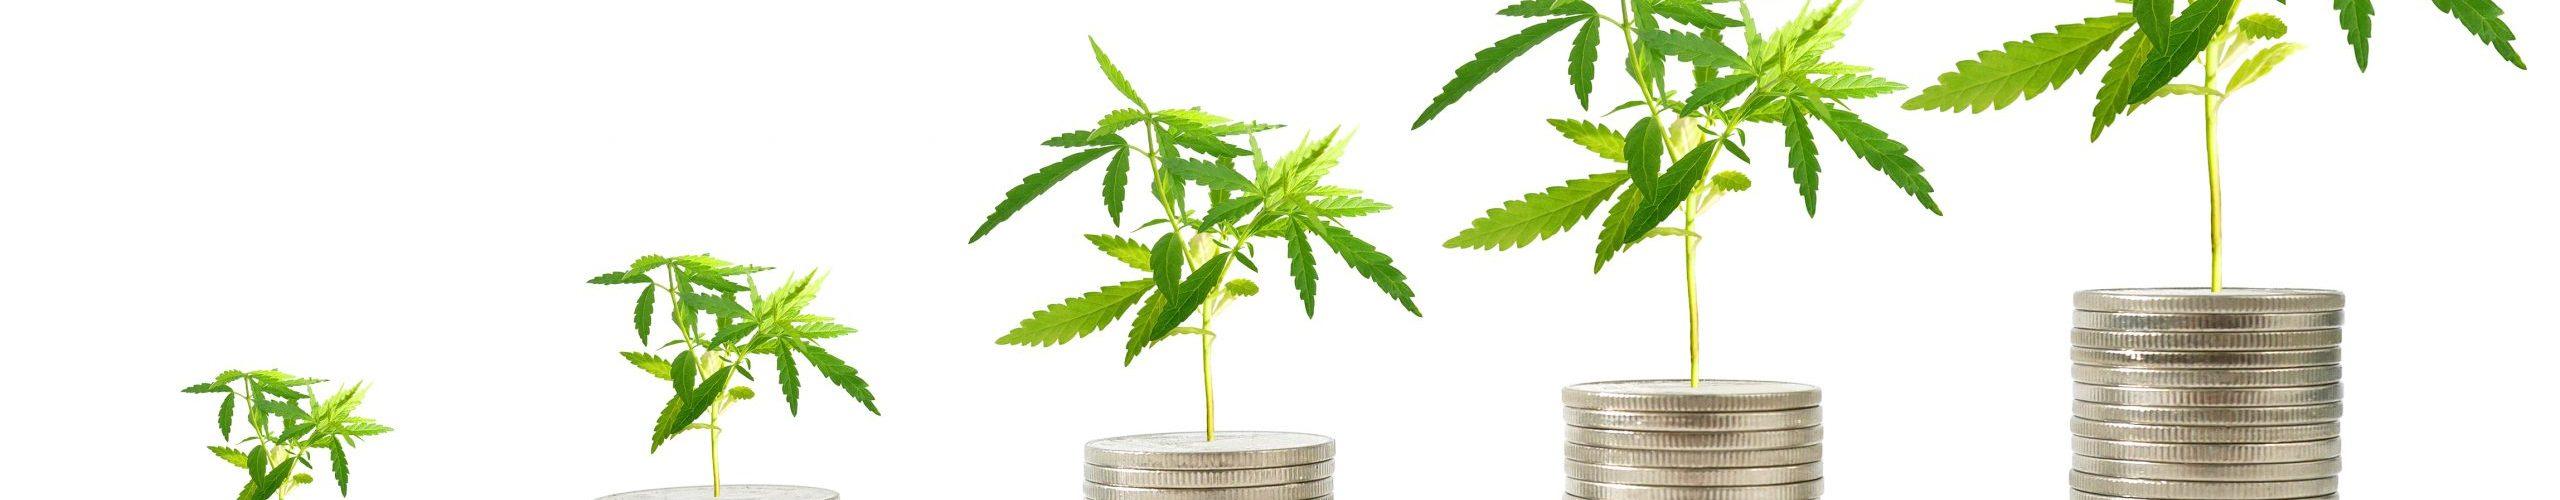 investment cannabis hemp